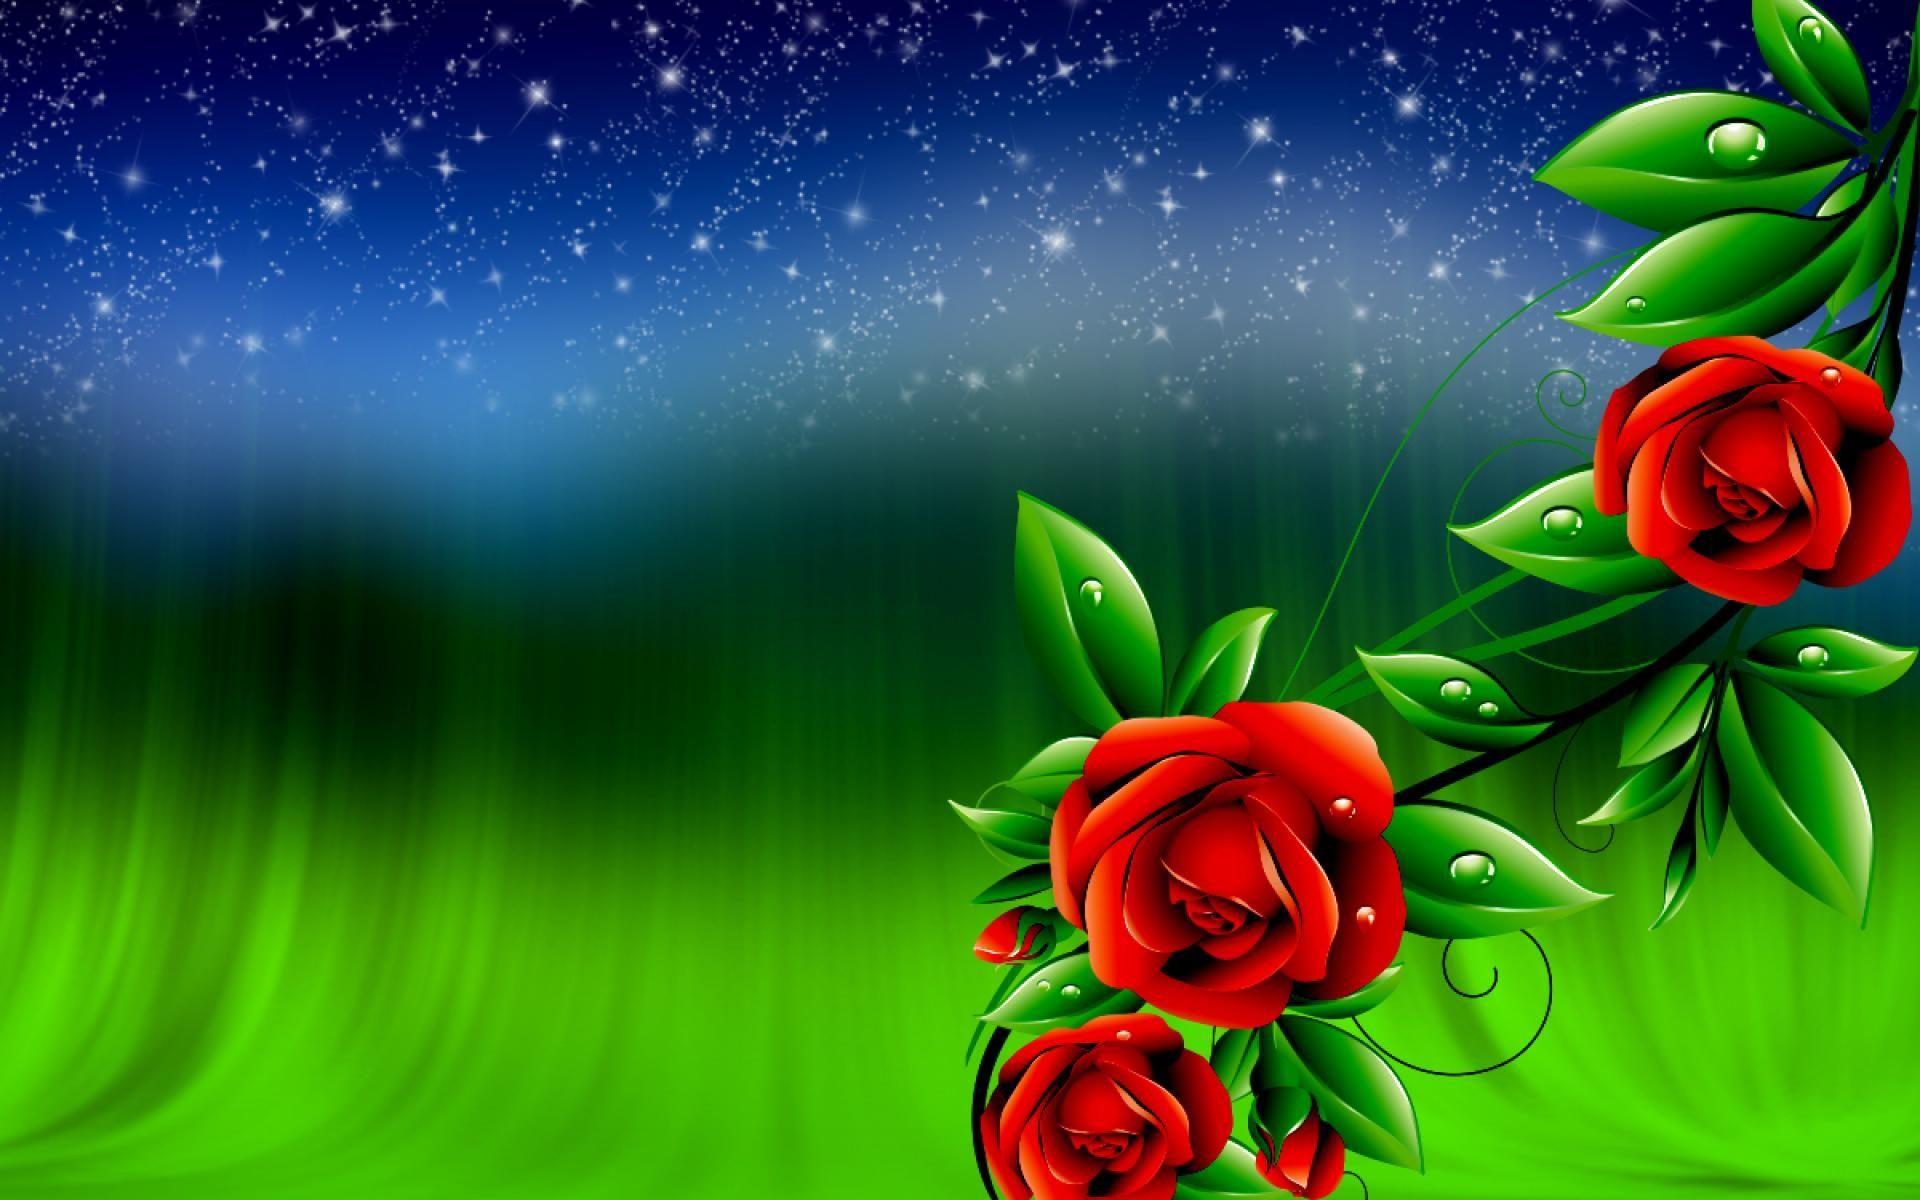 Rose Flower Background Hd ...